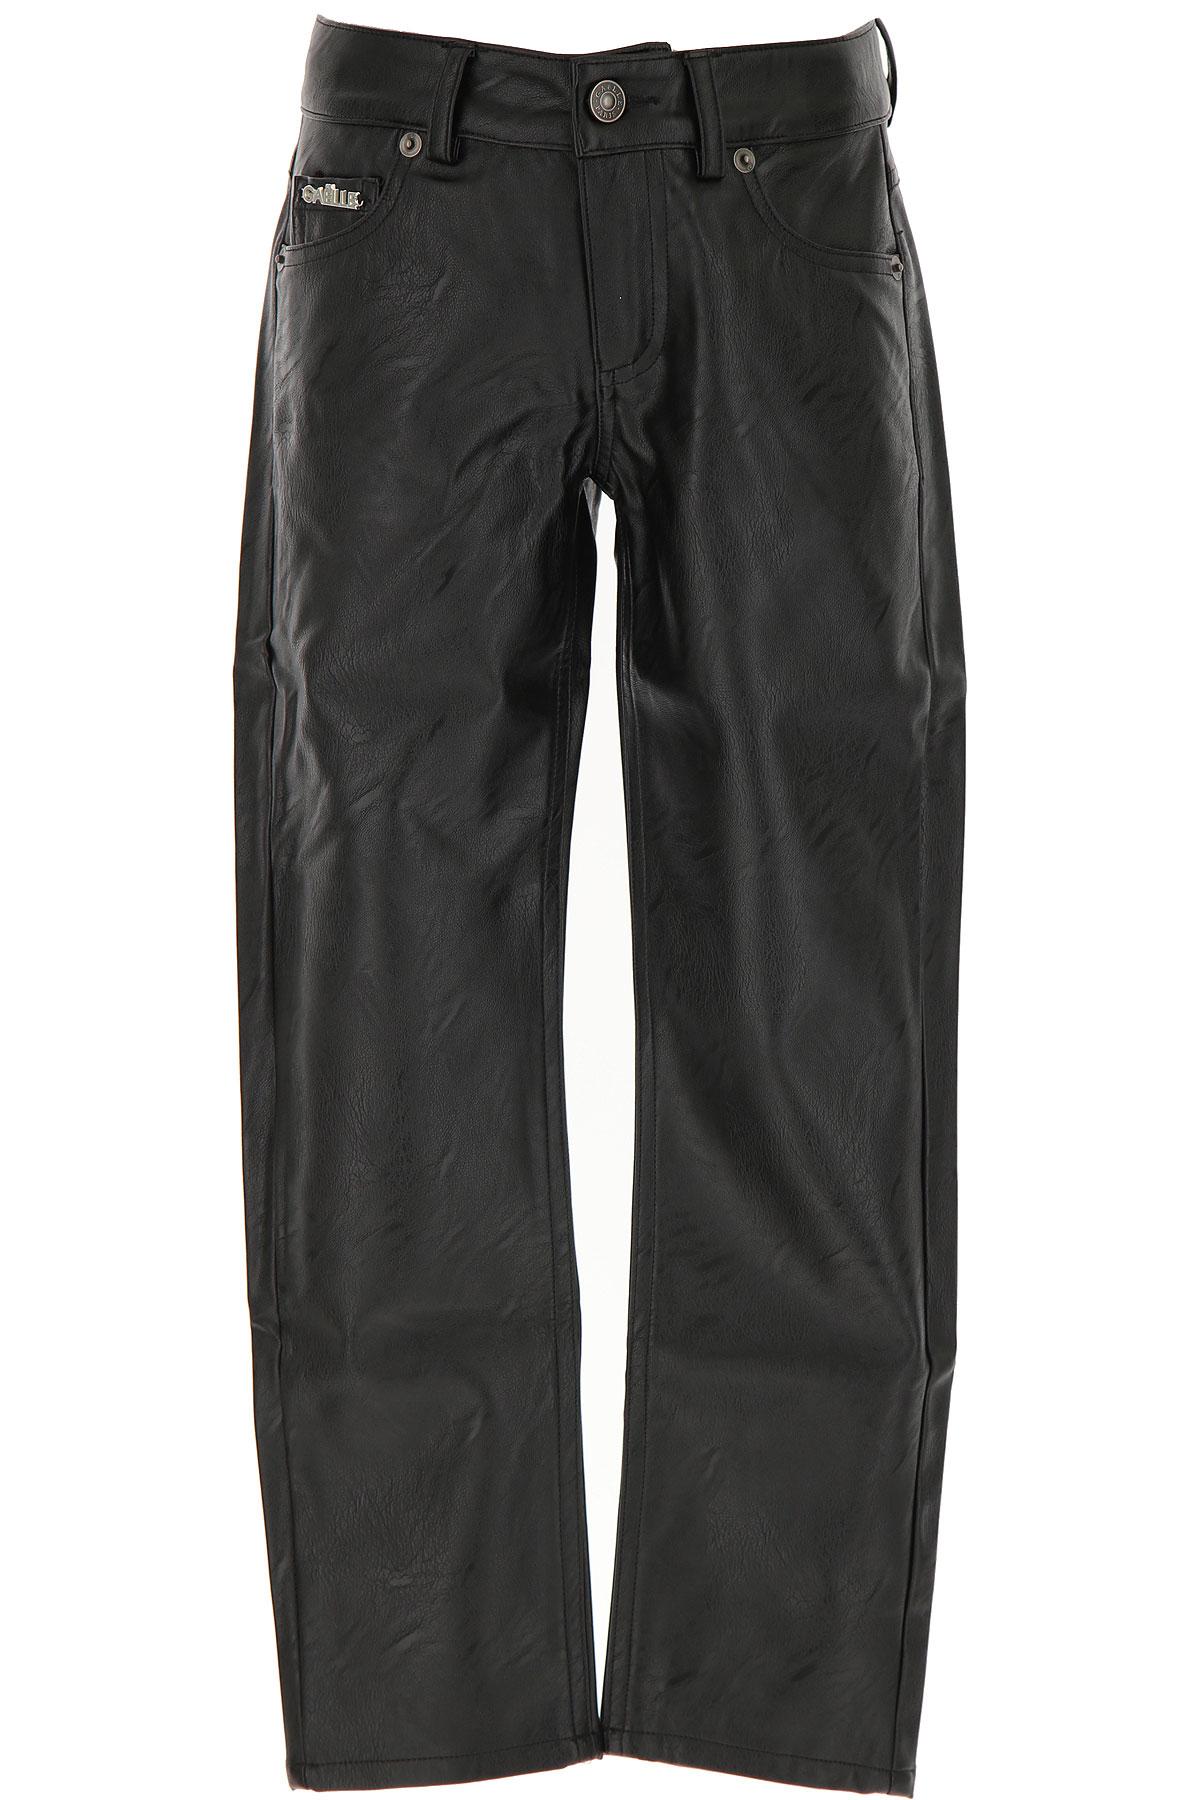 Gaelle Kids Pants for Girls On Sale, Black, polyurethane, 2019, 10Y 12Y 8Y